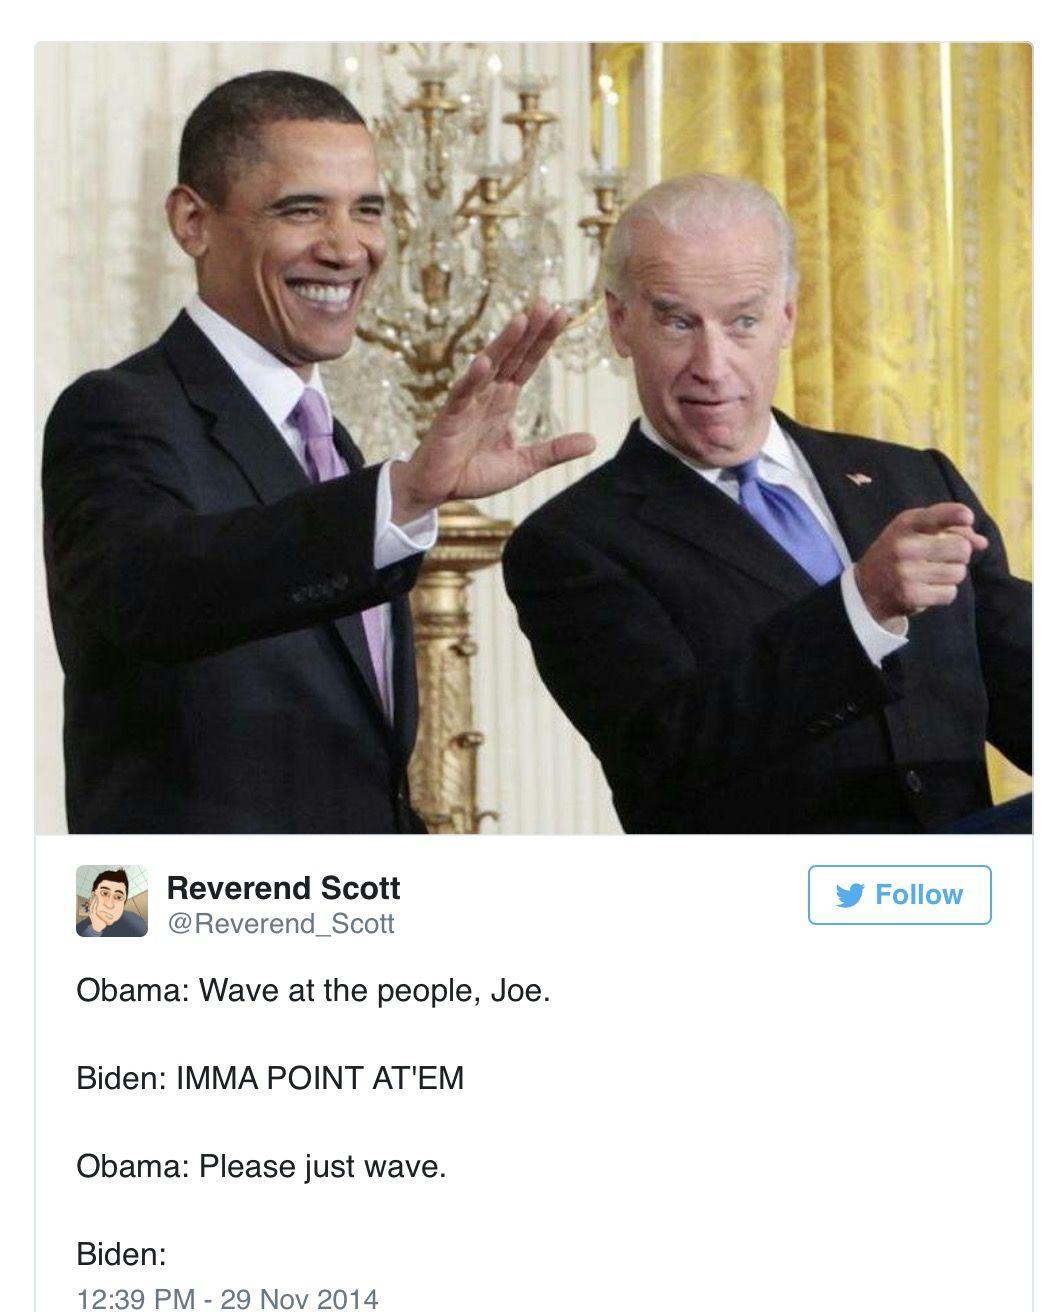 Pin by Cynthia Garrety on Words words words Obama funny